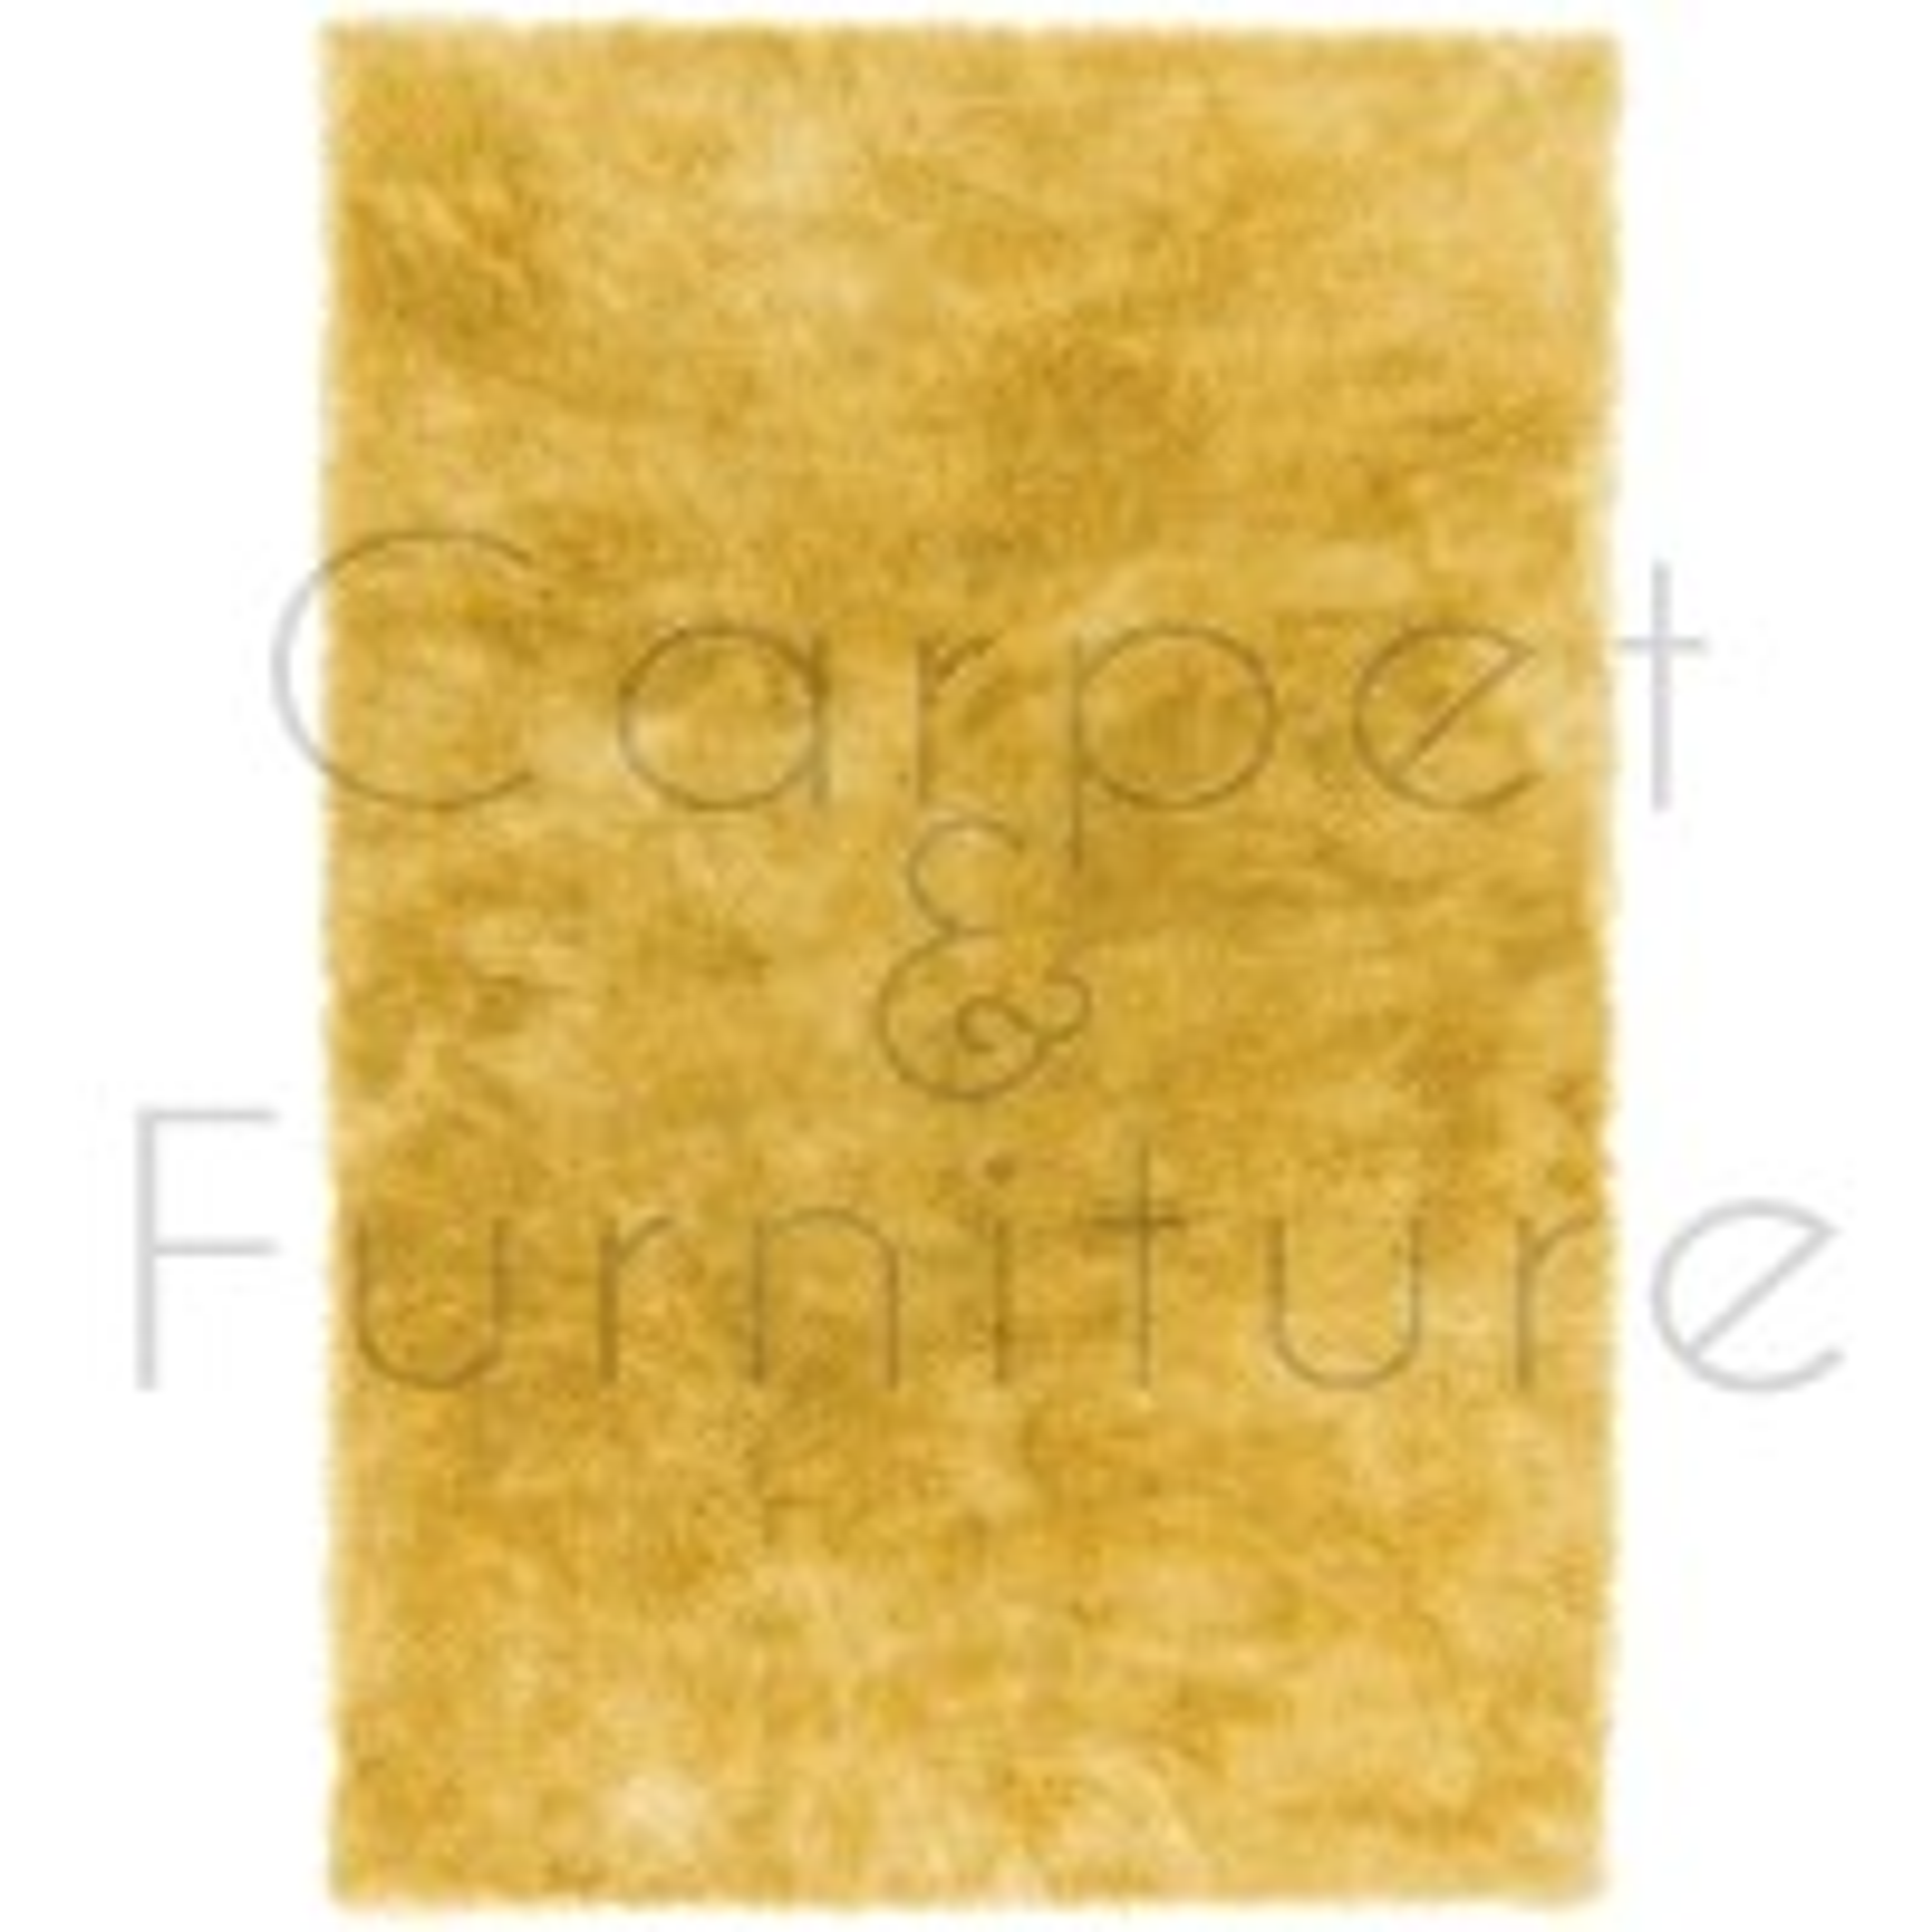 "Whisper Shaggy Rug - Yellow - Size 140 x 200 cm (4'7"" x 6'7"")"